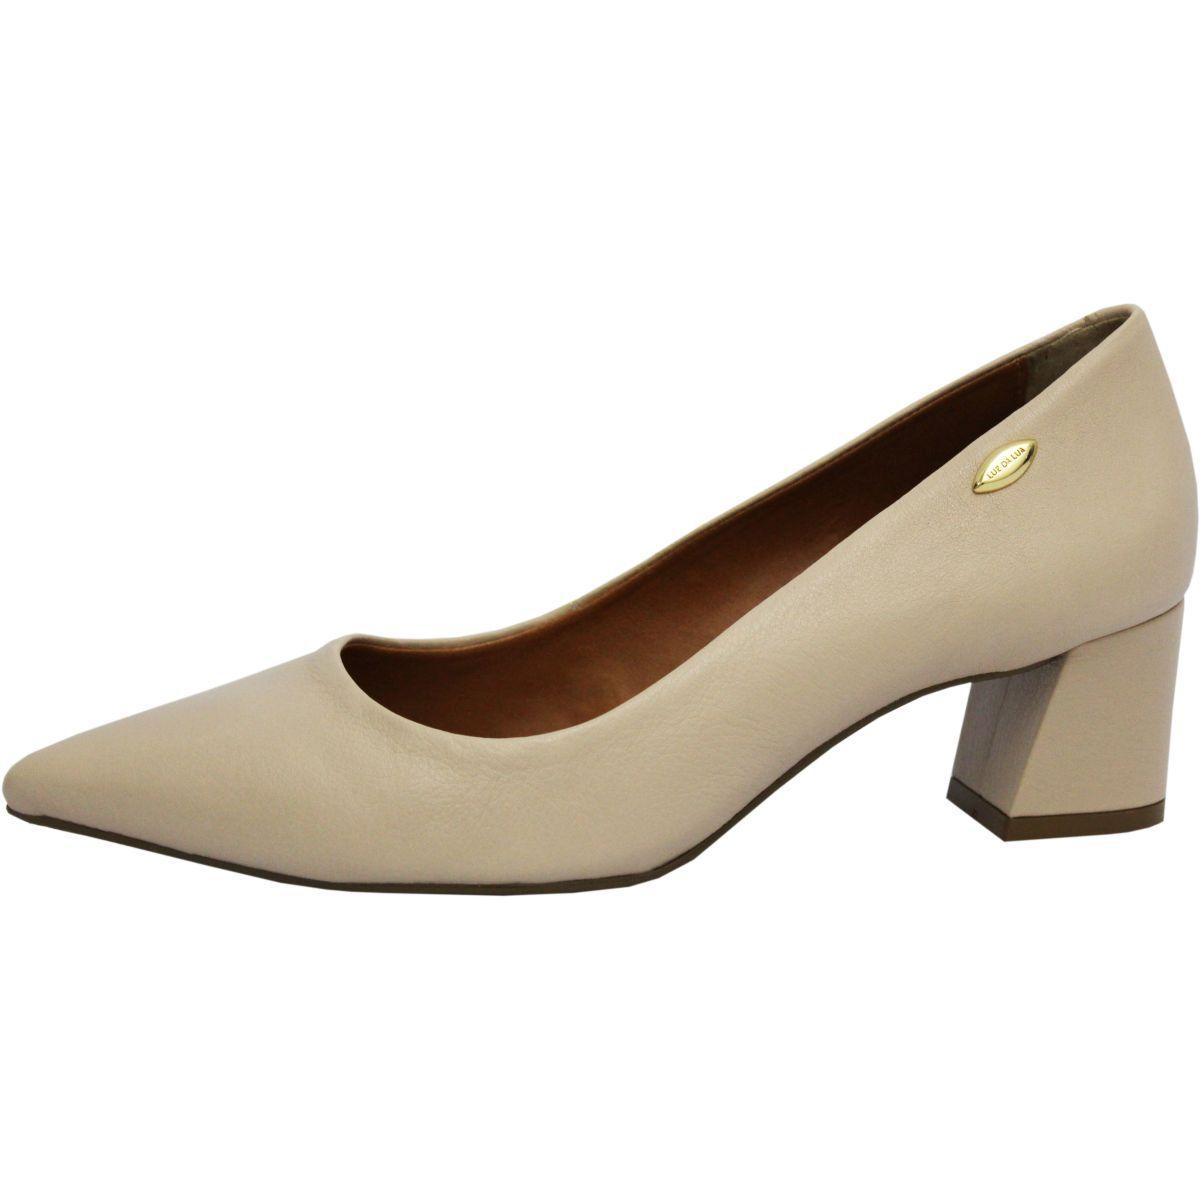 12d656279 Scarpin Luz da Lua S65614V18 - Dimazzee Shoes & Bags